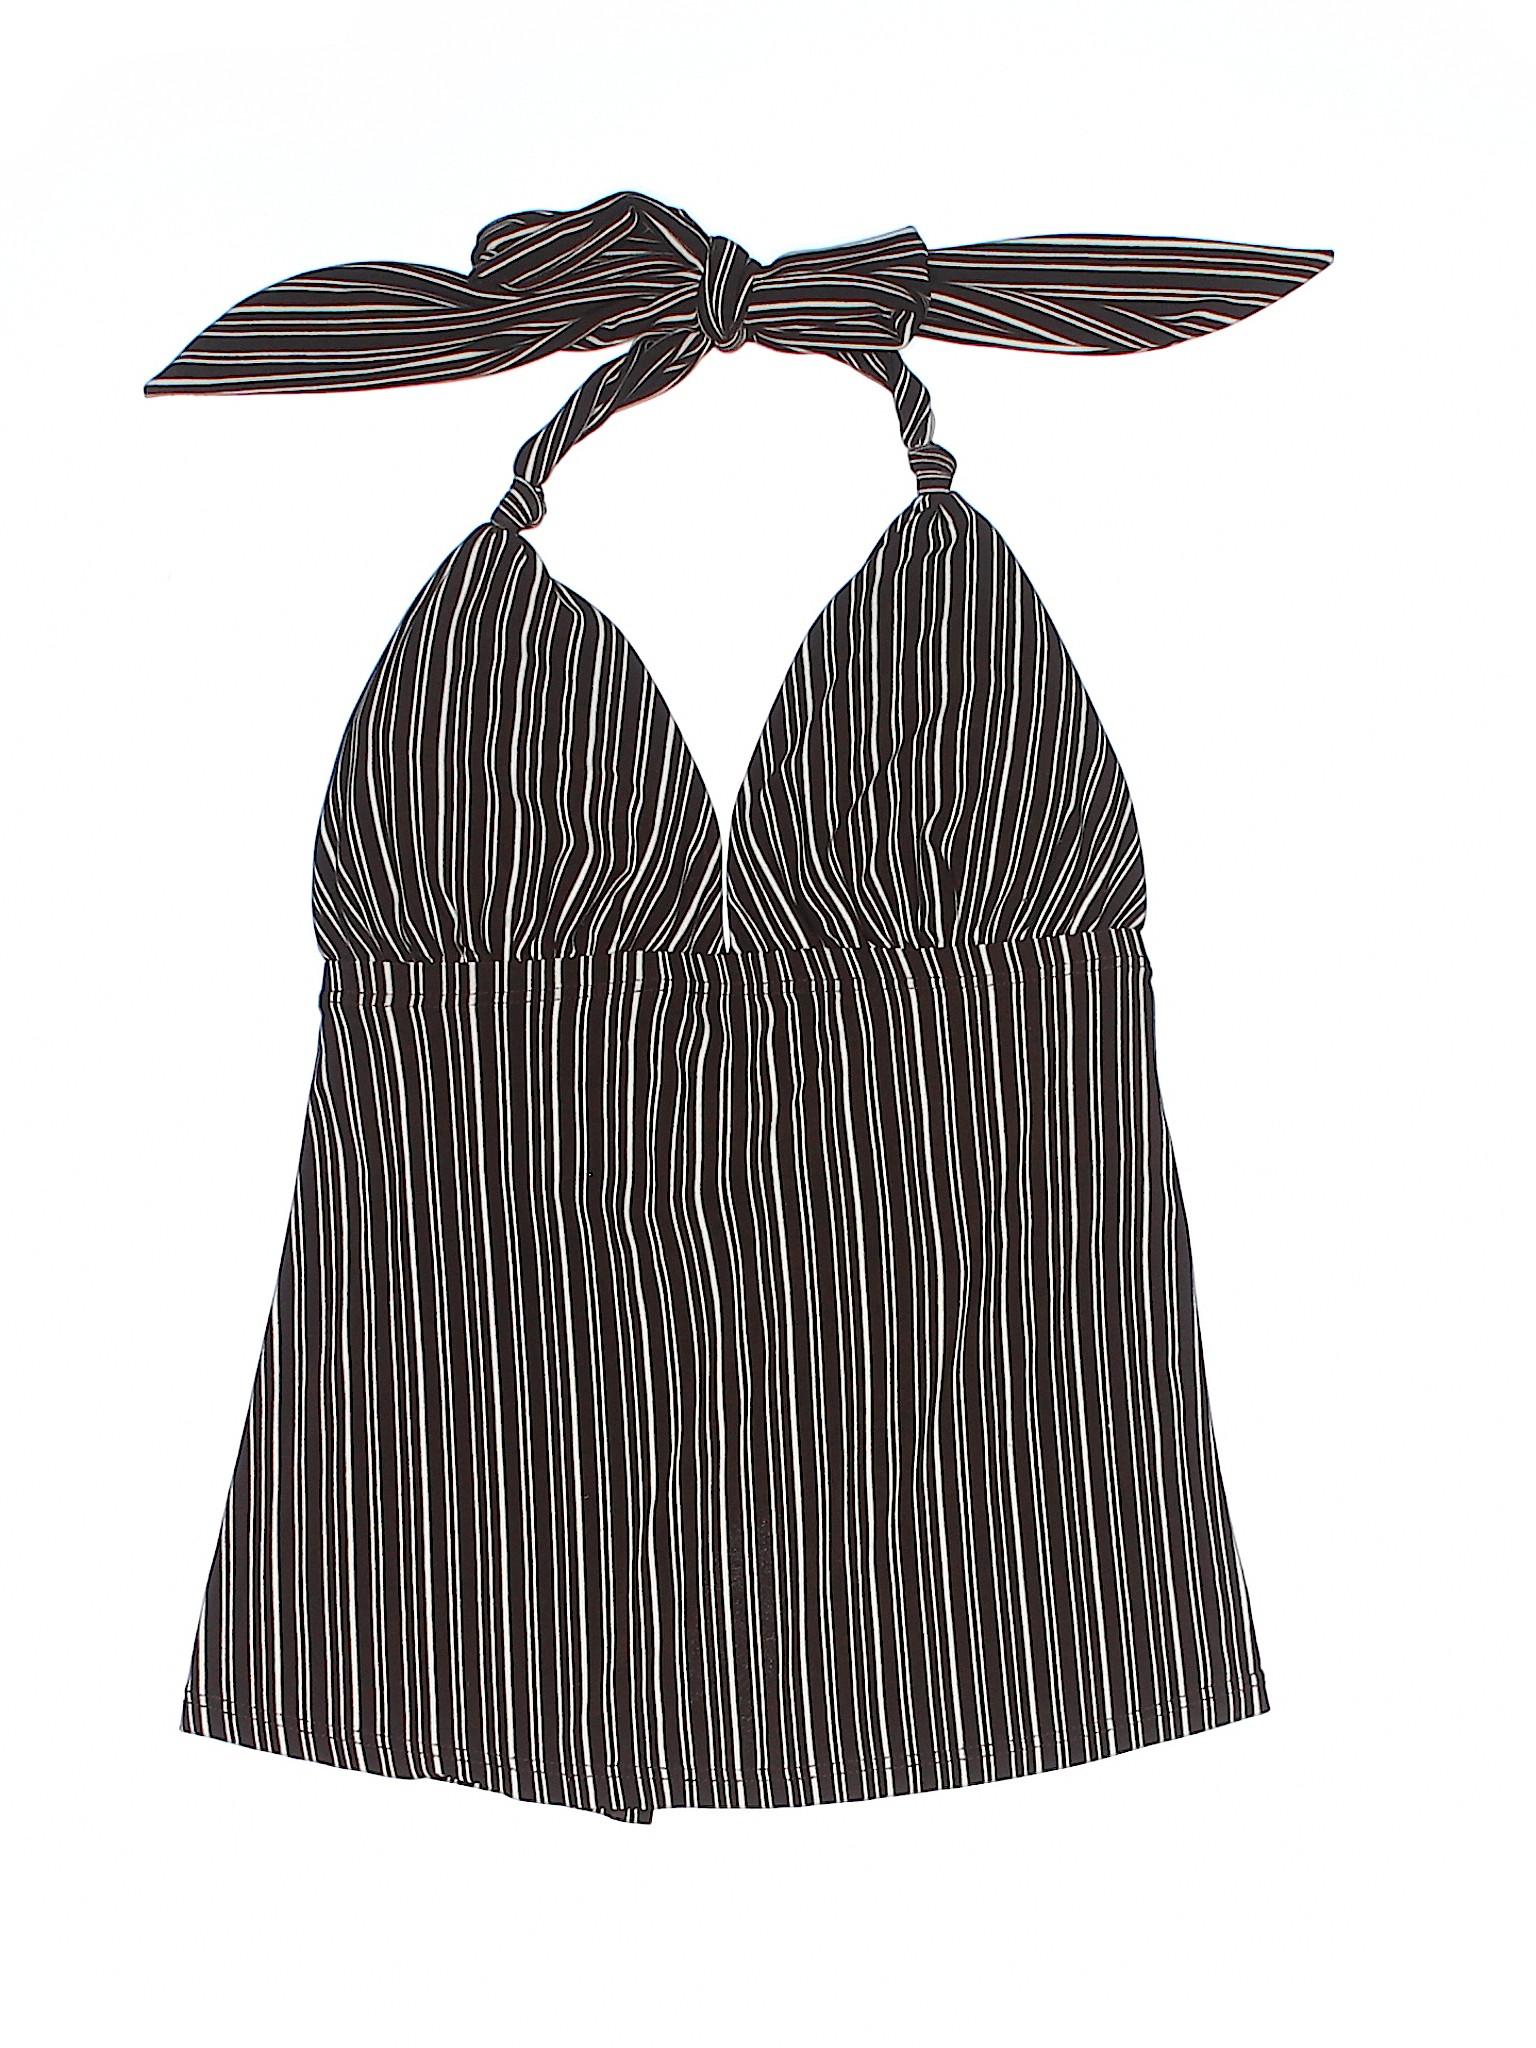 Swimsuit Top Top Robin Swimsuit Robin Piccone Piccone Boutique Boutique 5x08xqBw